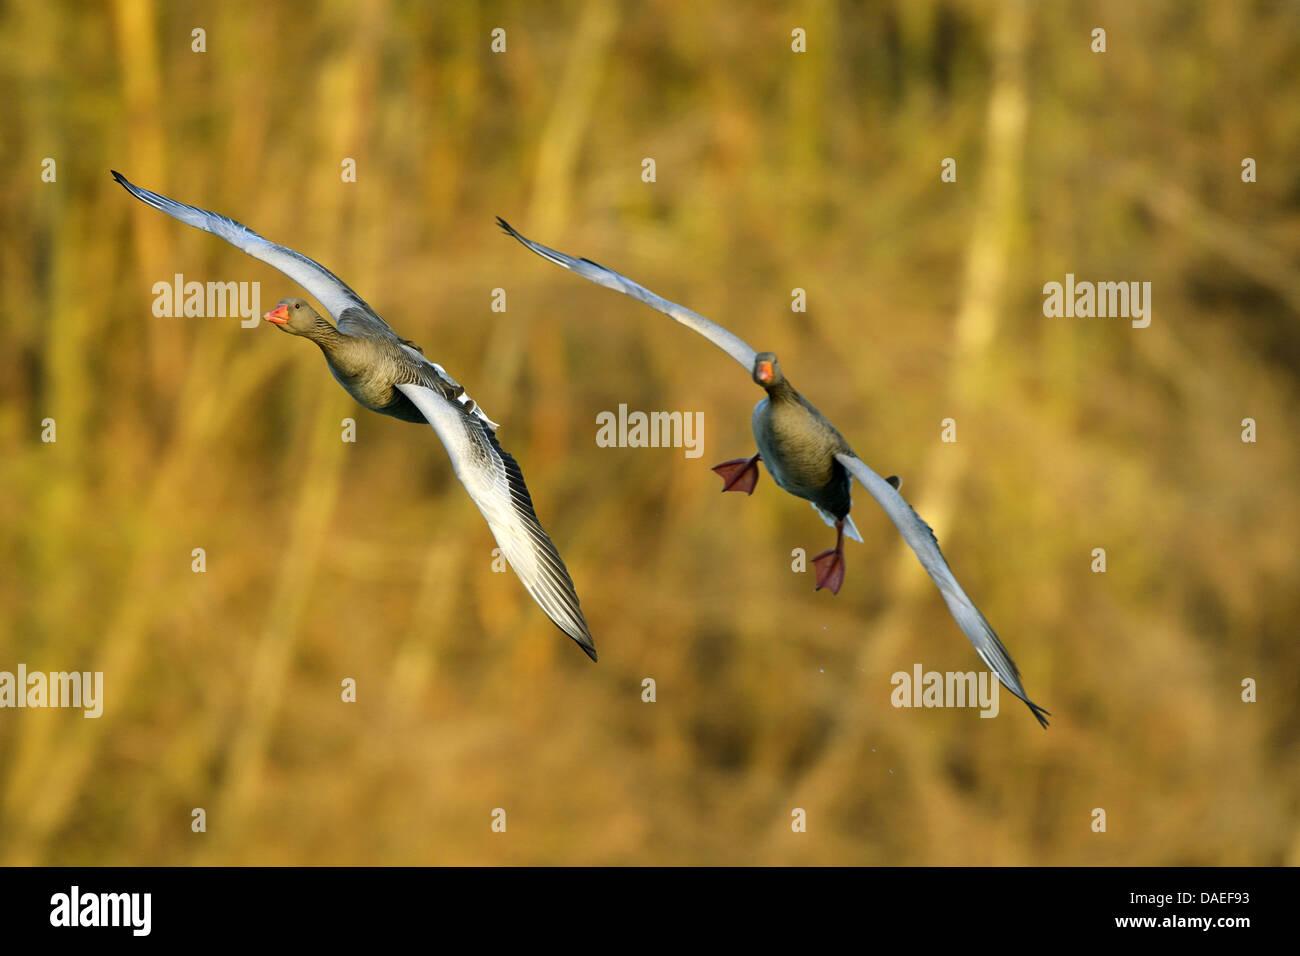 greylag goose (Anser anser), two Grey Lag Goose im Landeanflug, Germany, Bavaria Stock Photo